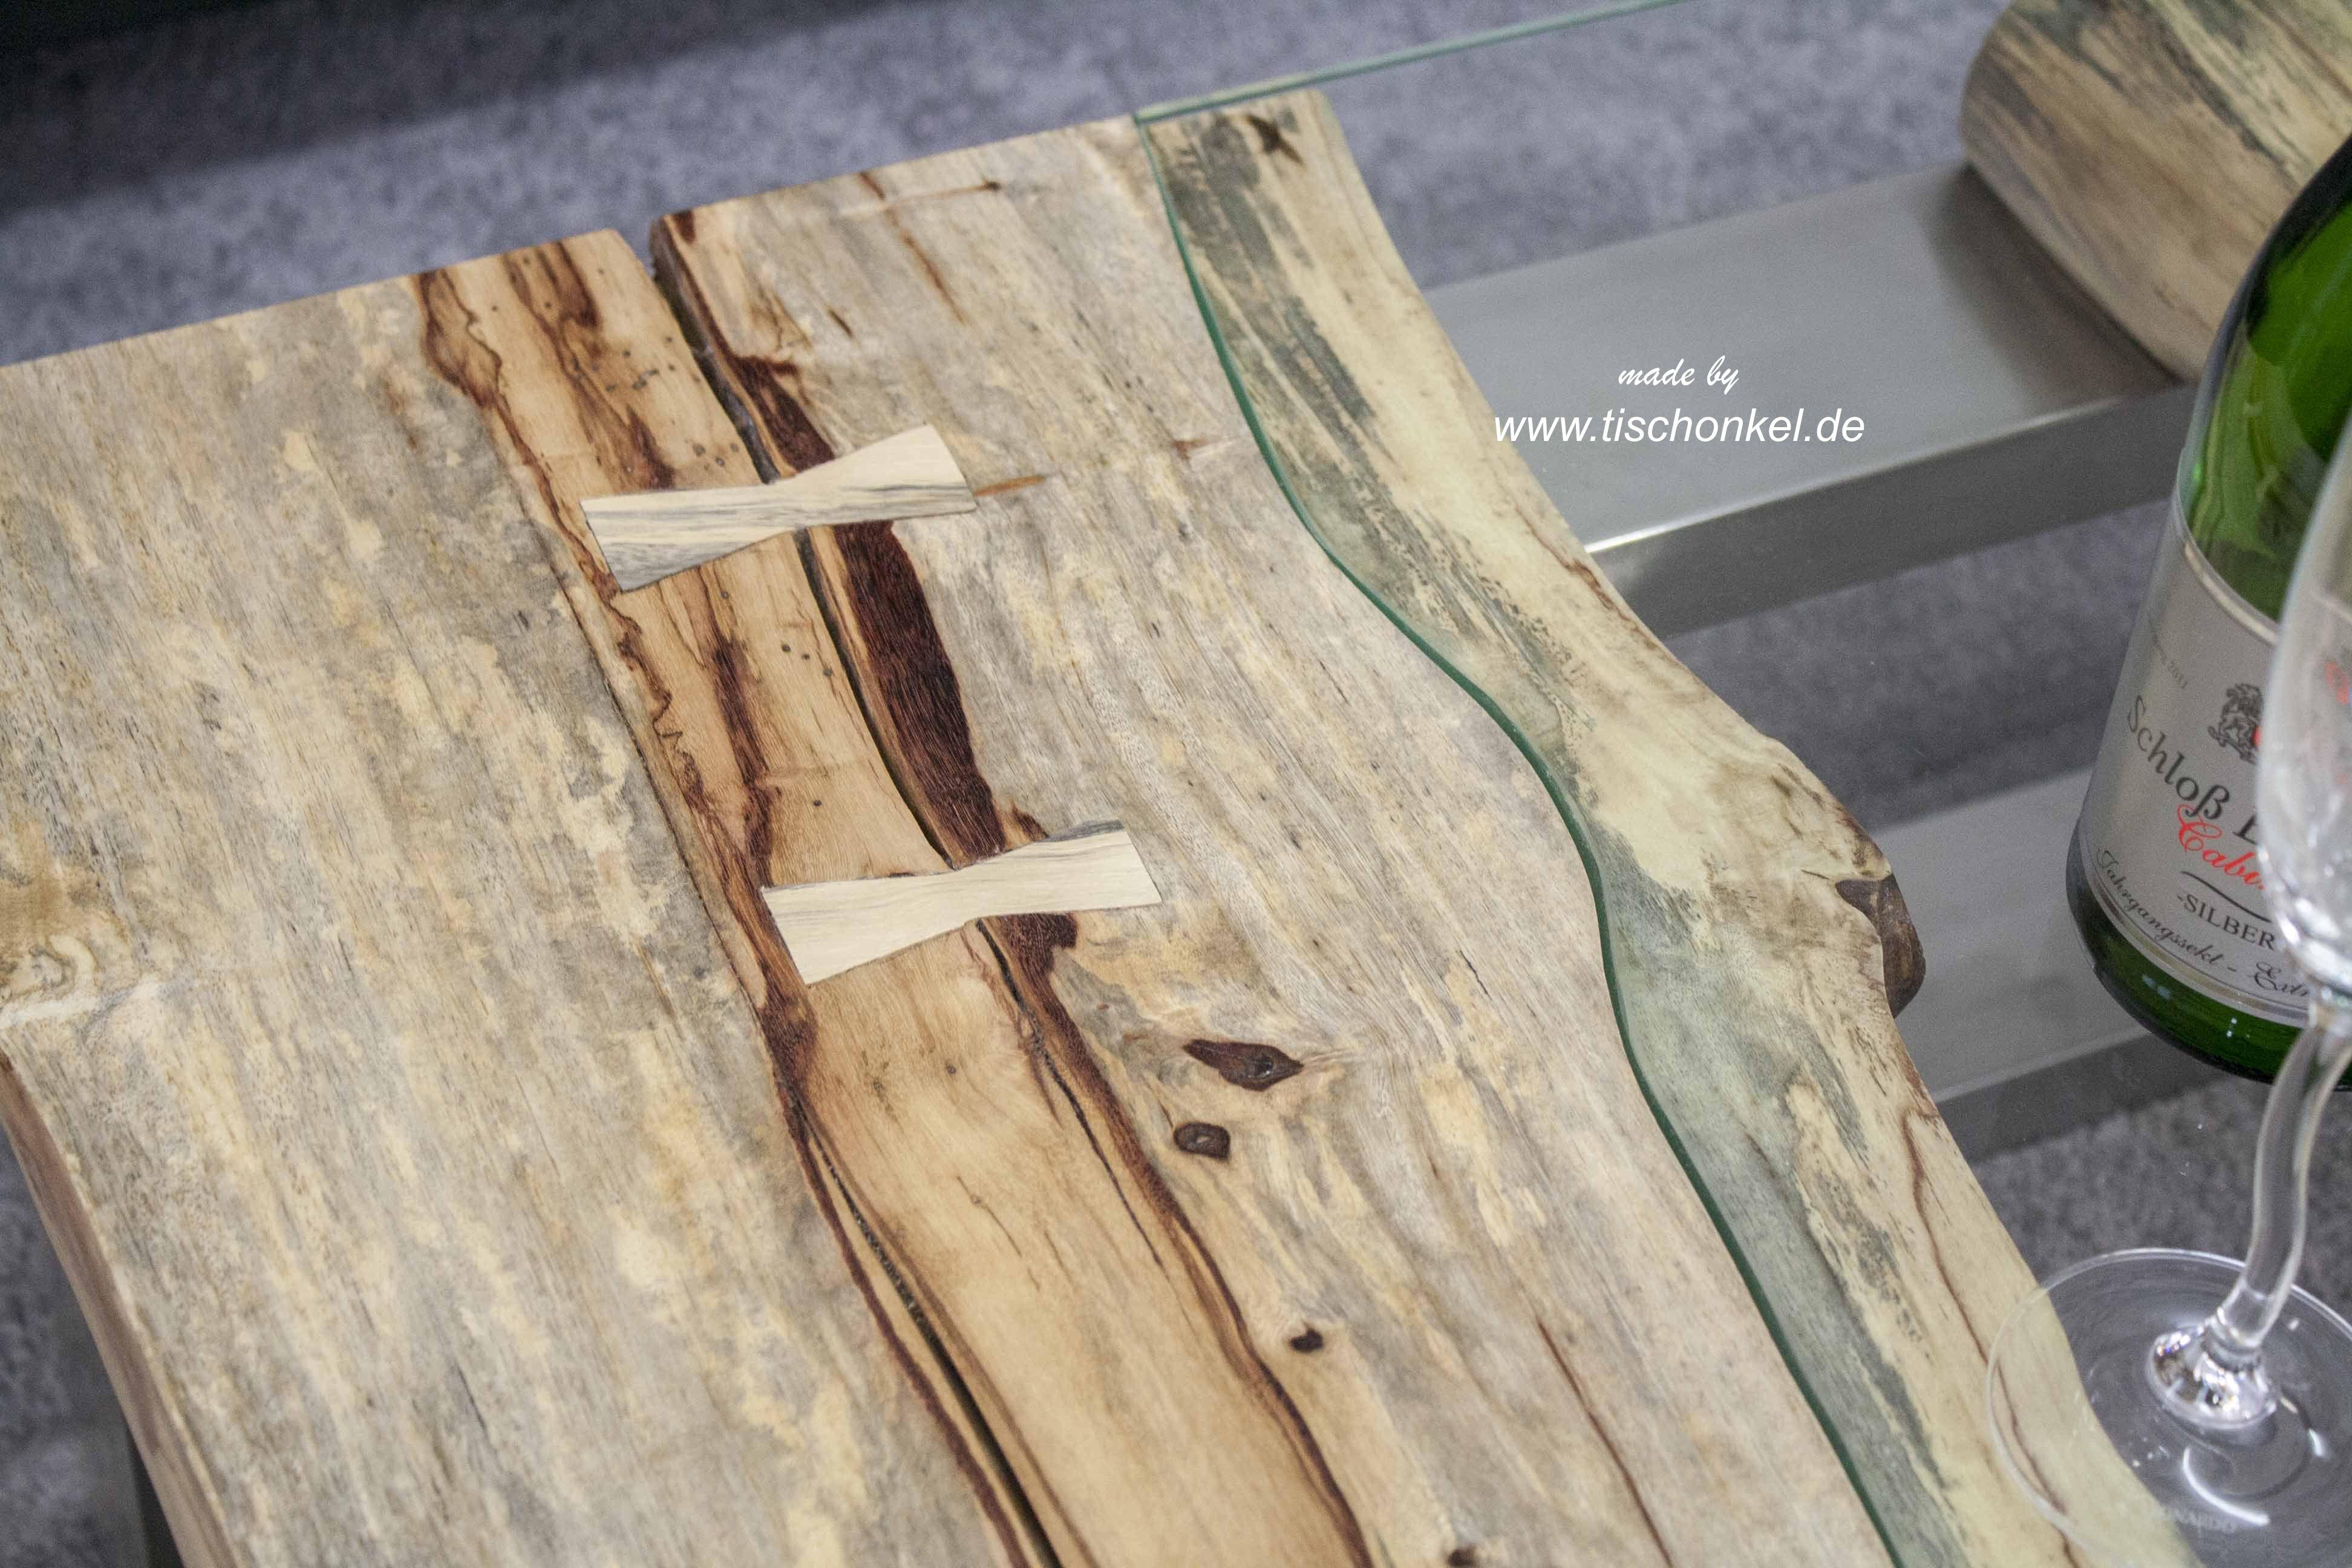 Design Couchtisch Serie Elements  Der Tischonkel